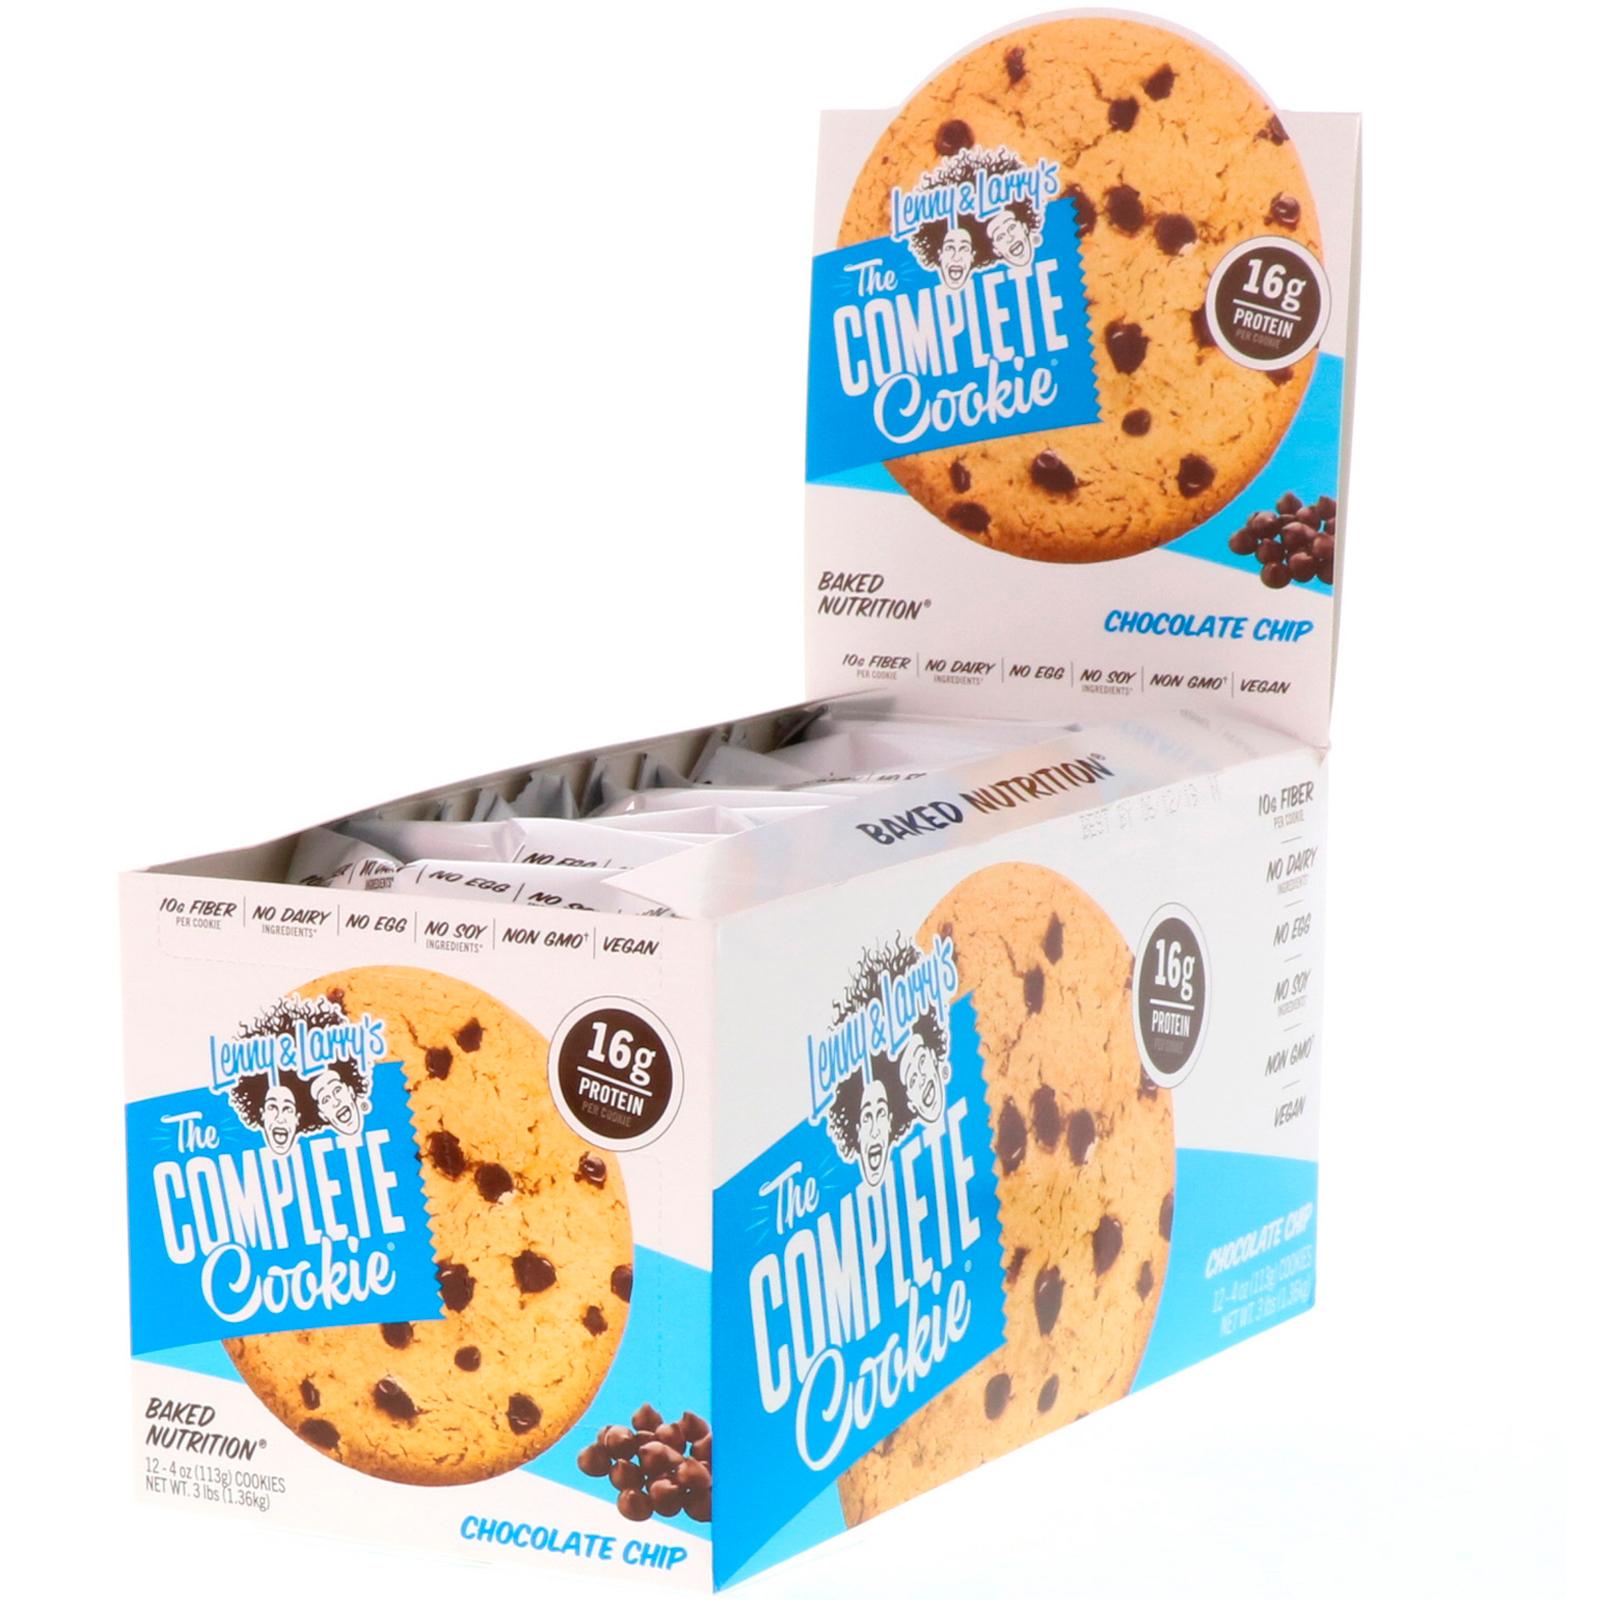 lenny larry s 完全なクッキー チョコレートチップ 12クッキー 各4